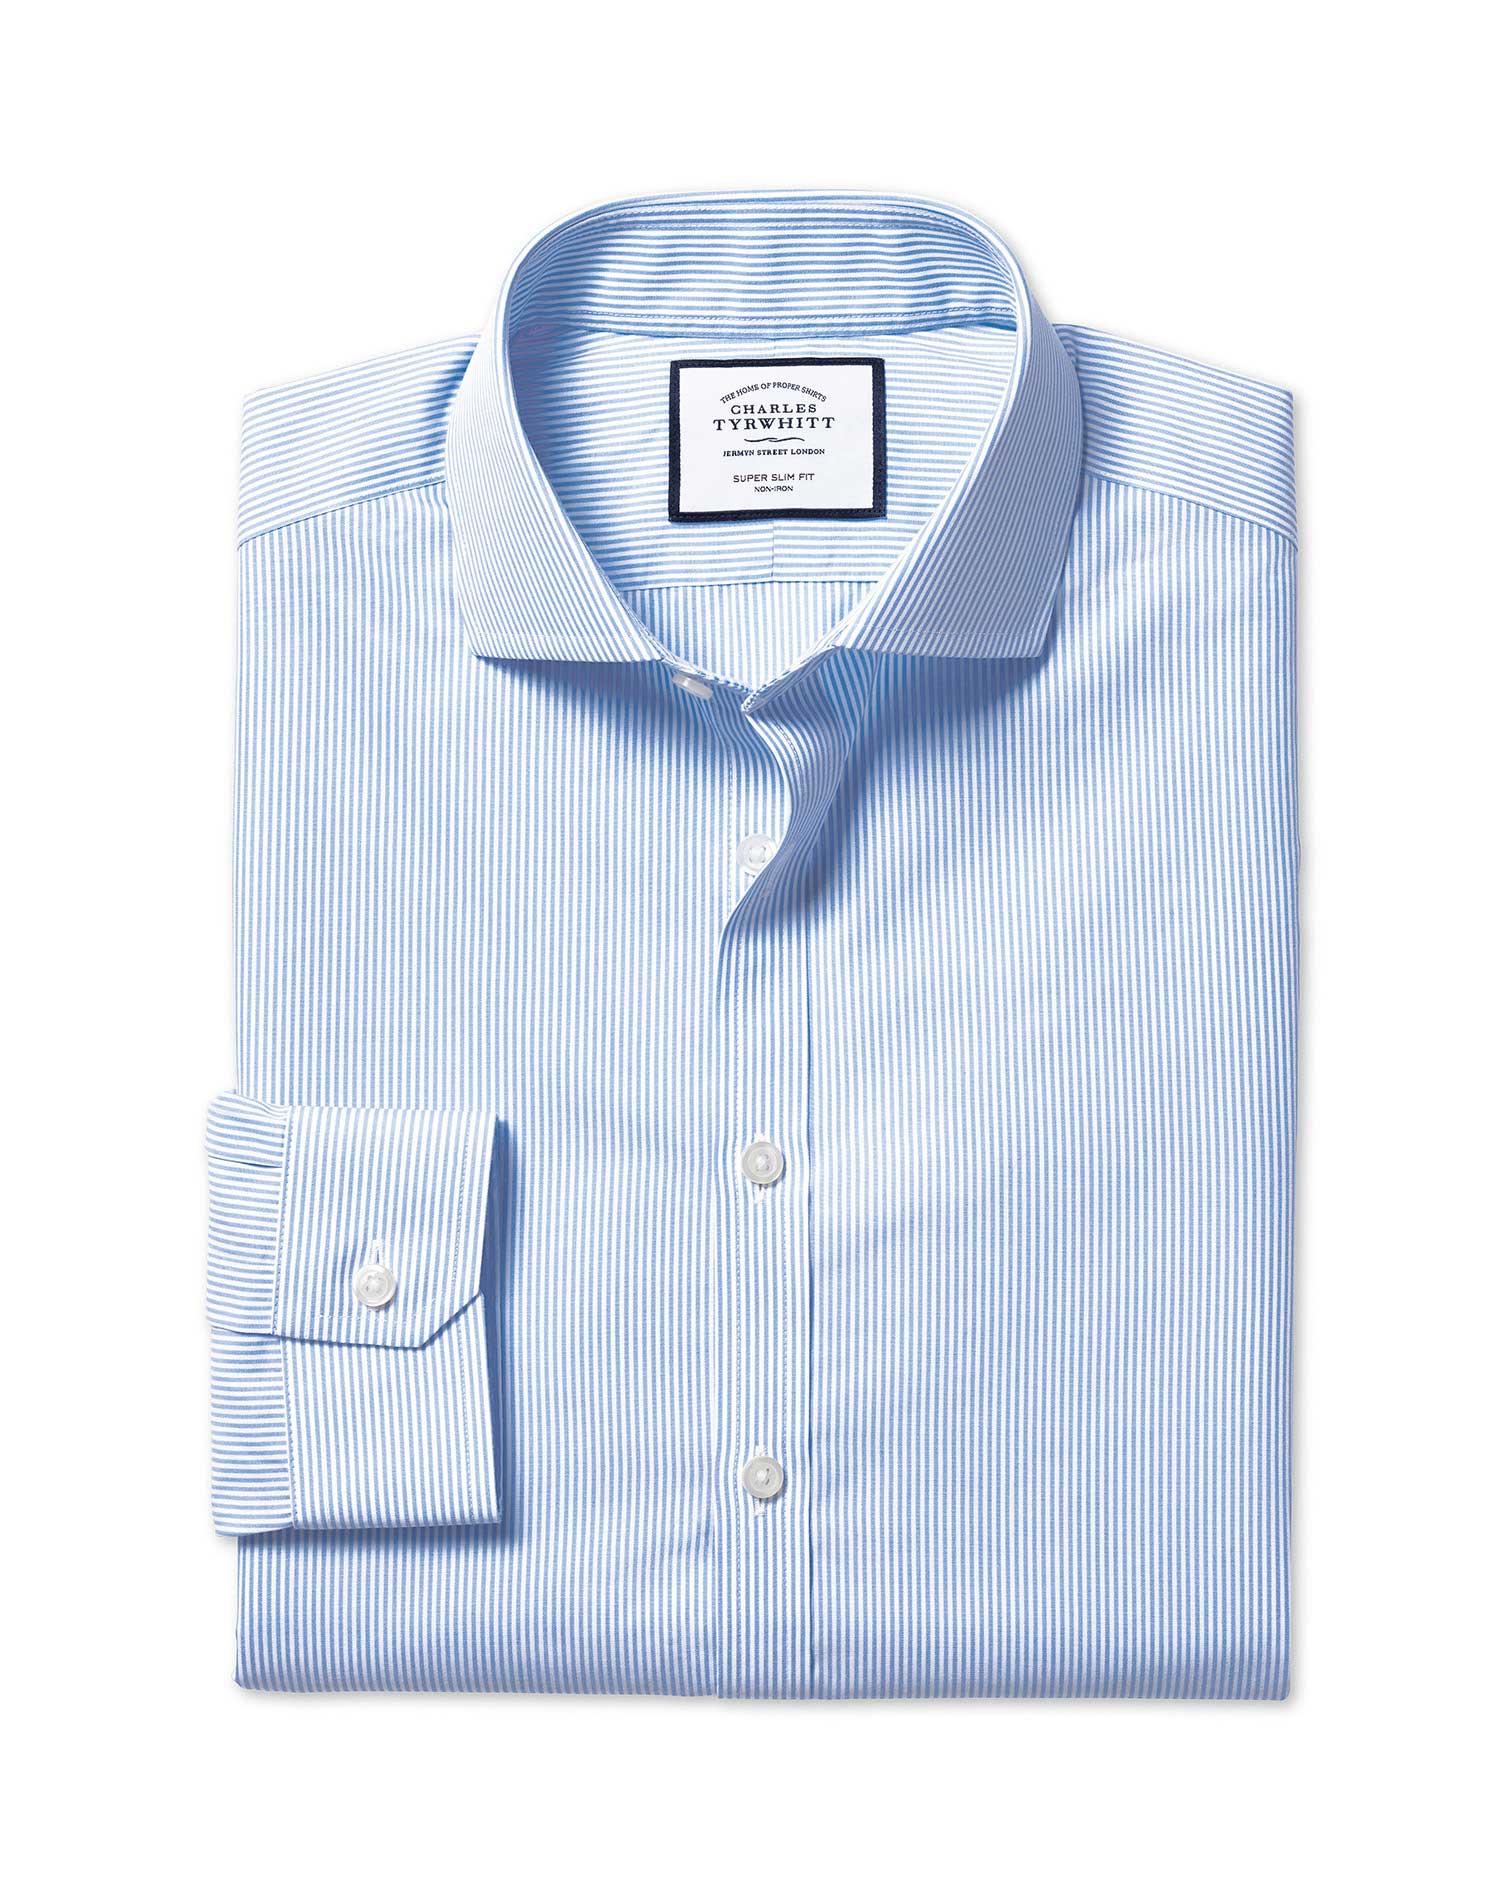 Cotton Super Slim Fit Non-Iron Cutaway Sky Blue Bengal Stripe Shirt